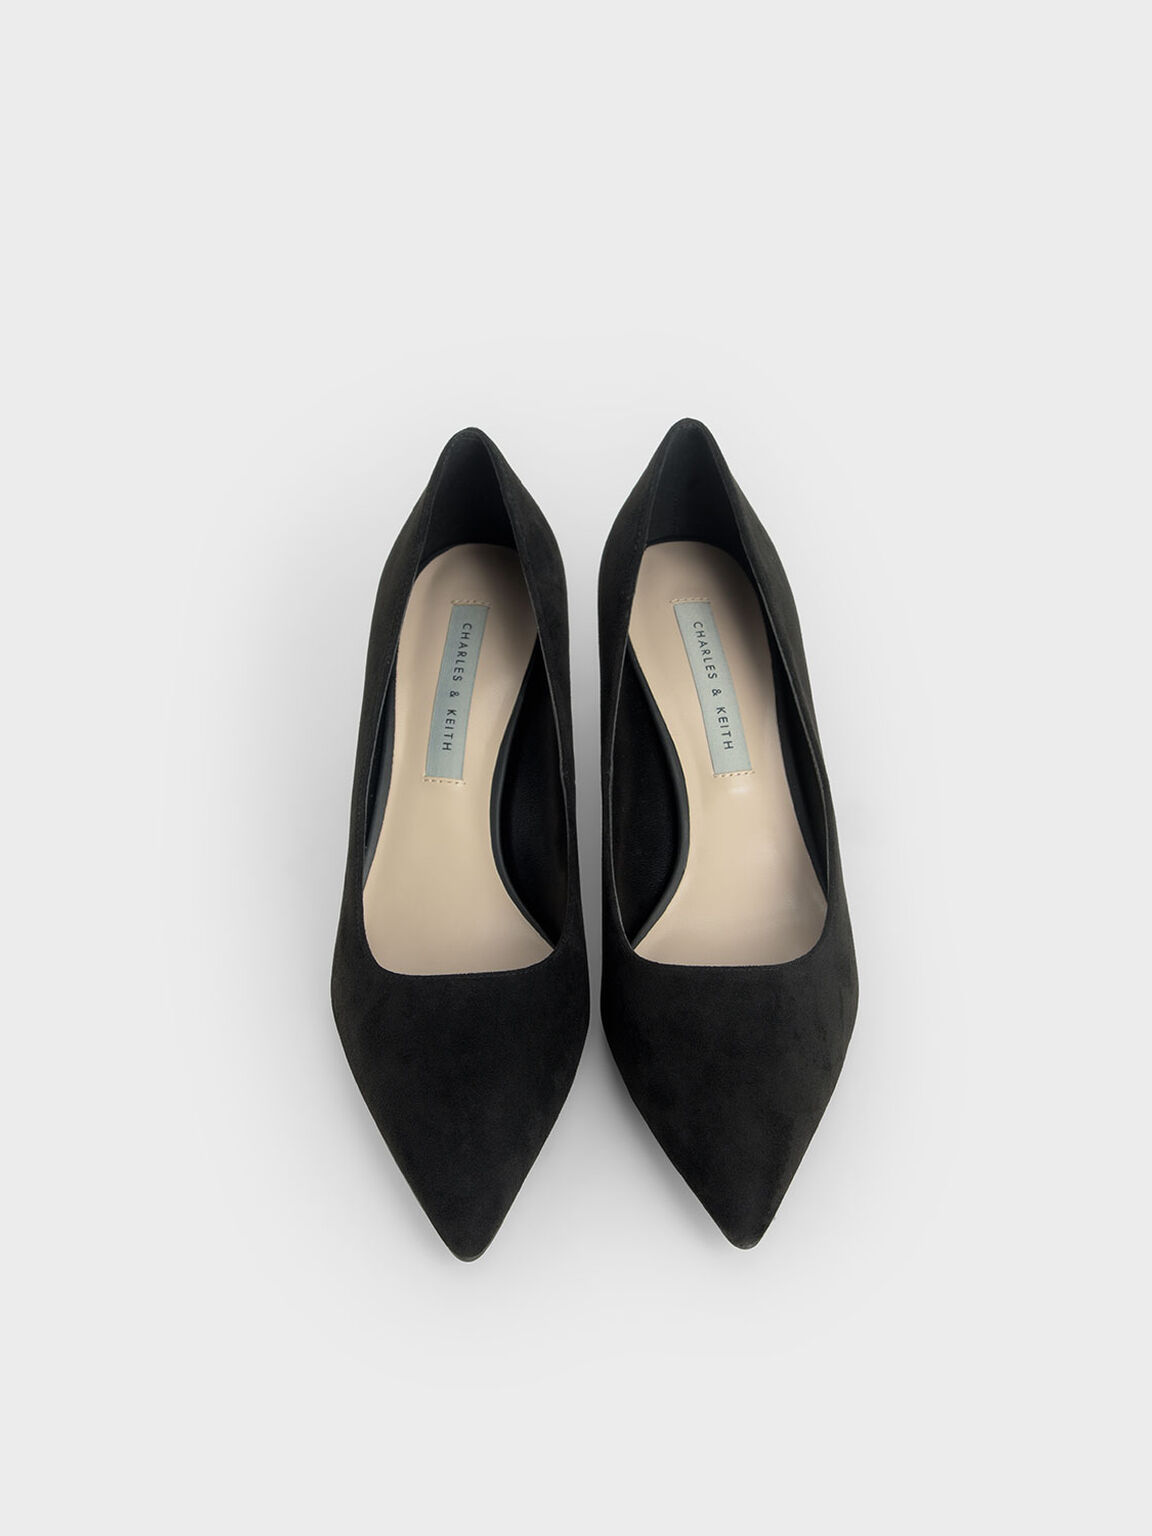 Cylindrical Heel Pointed Toe Pumps, Black, hi-res